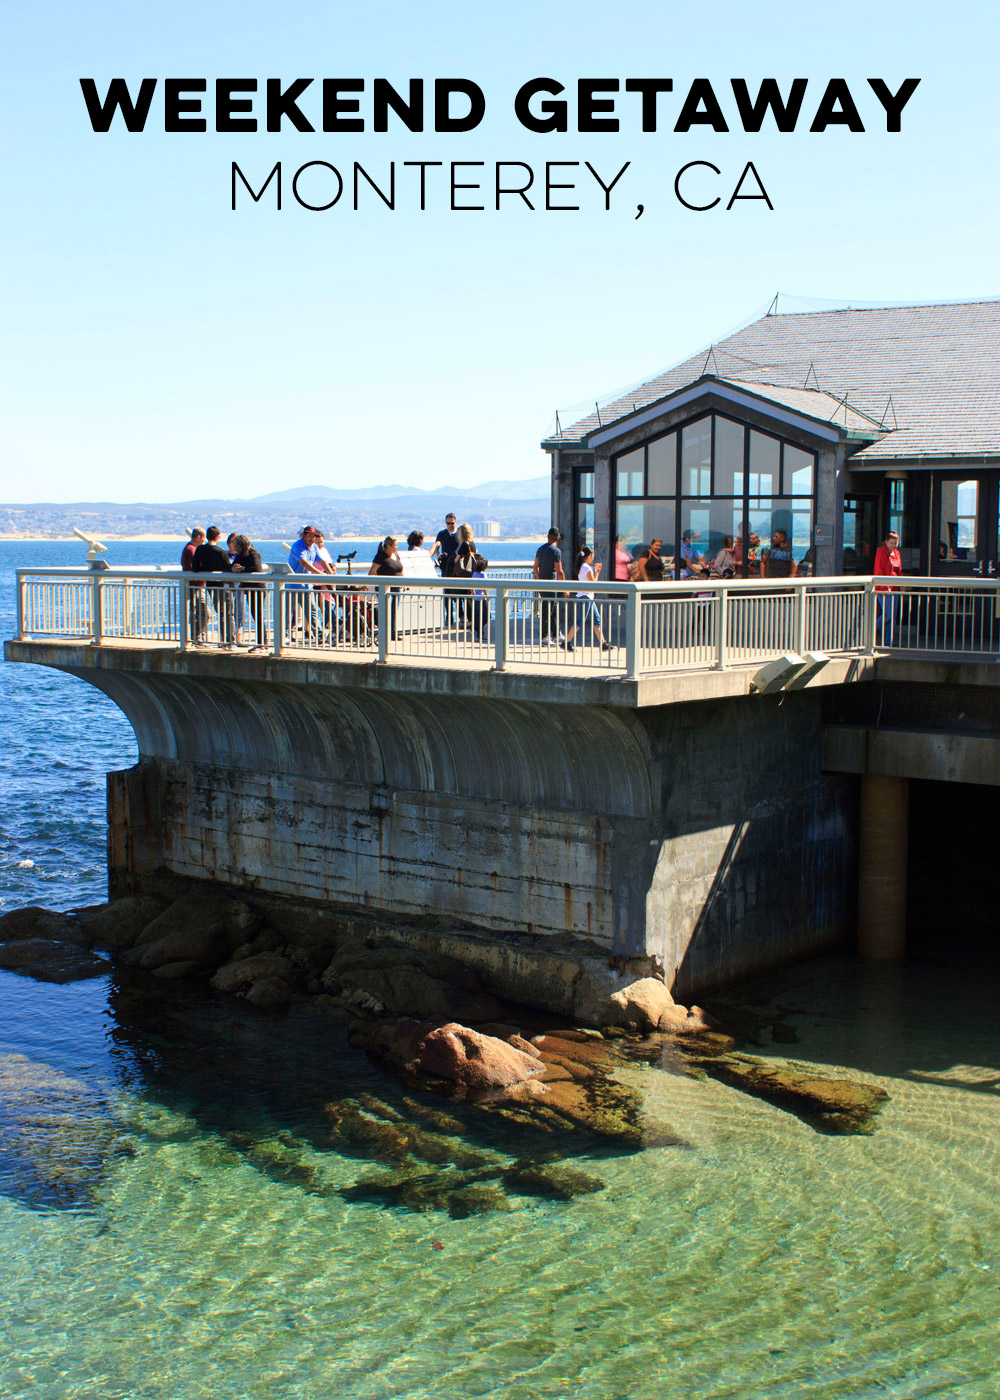 Weekend Getaway: Monterey, CA | shannonmcnab.com